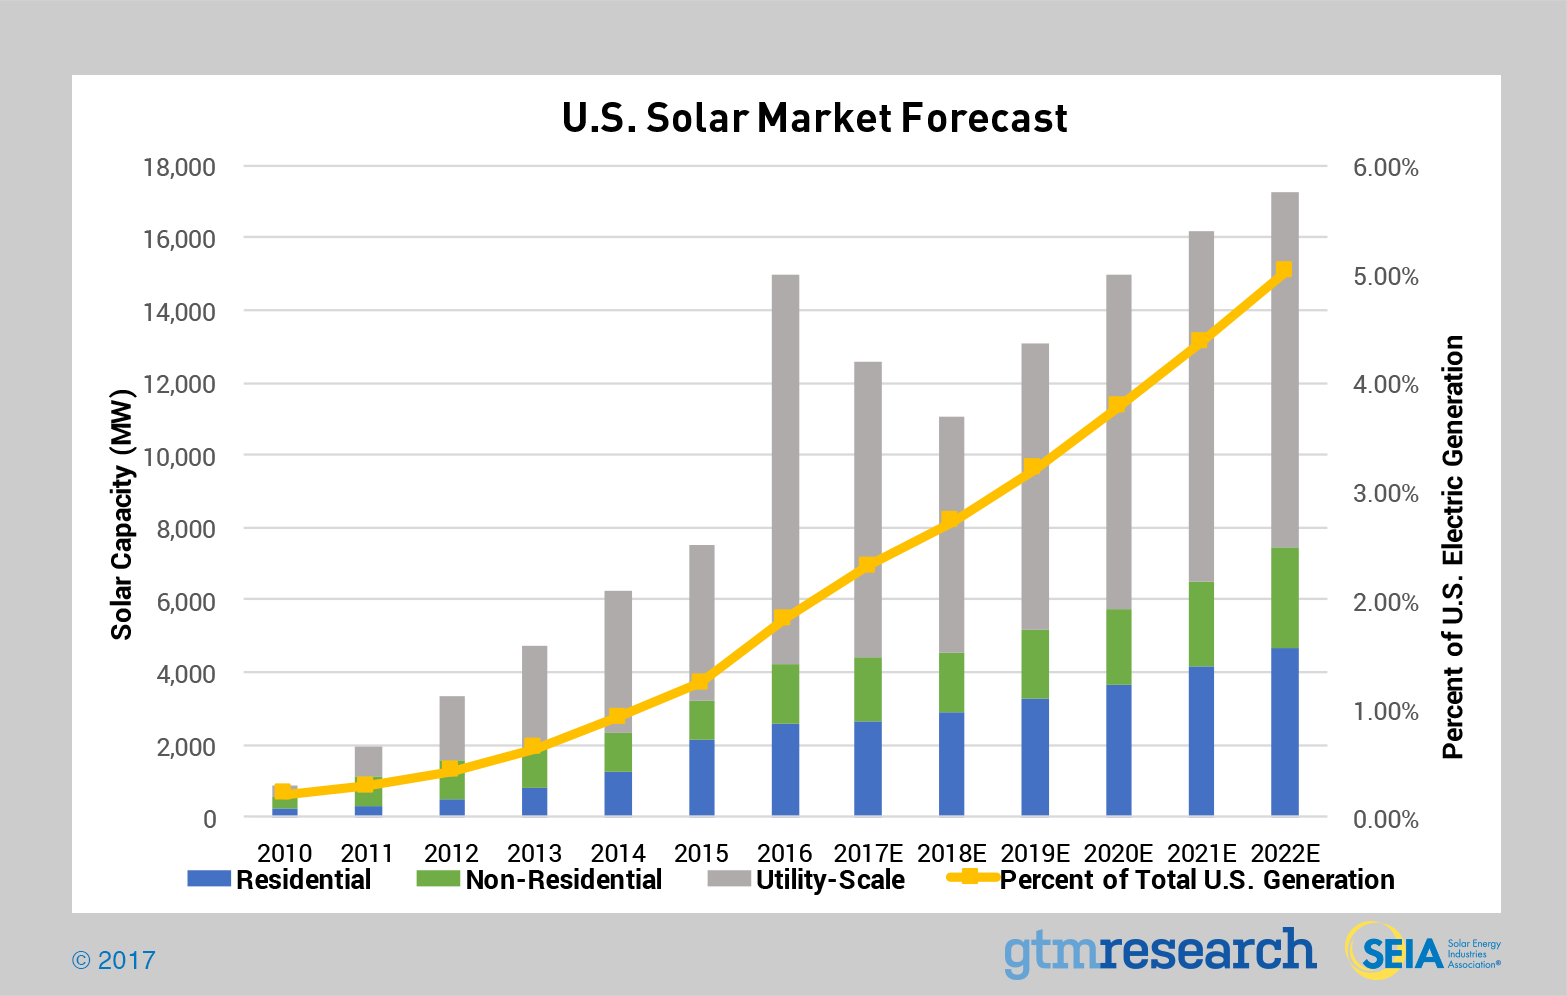 U.S. solar deployment forecast